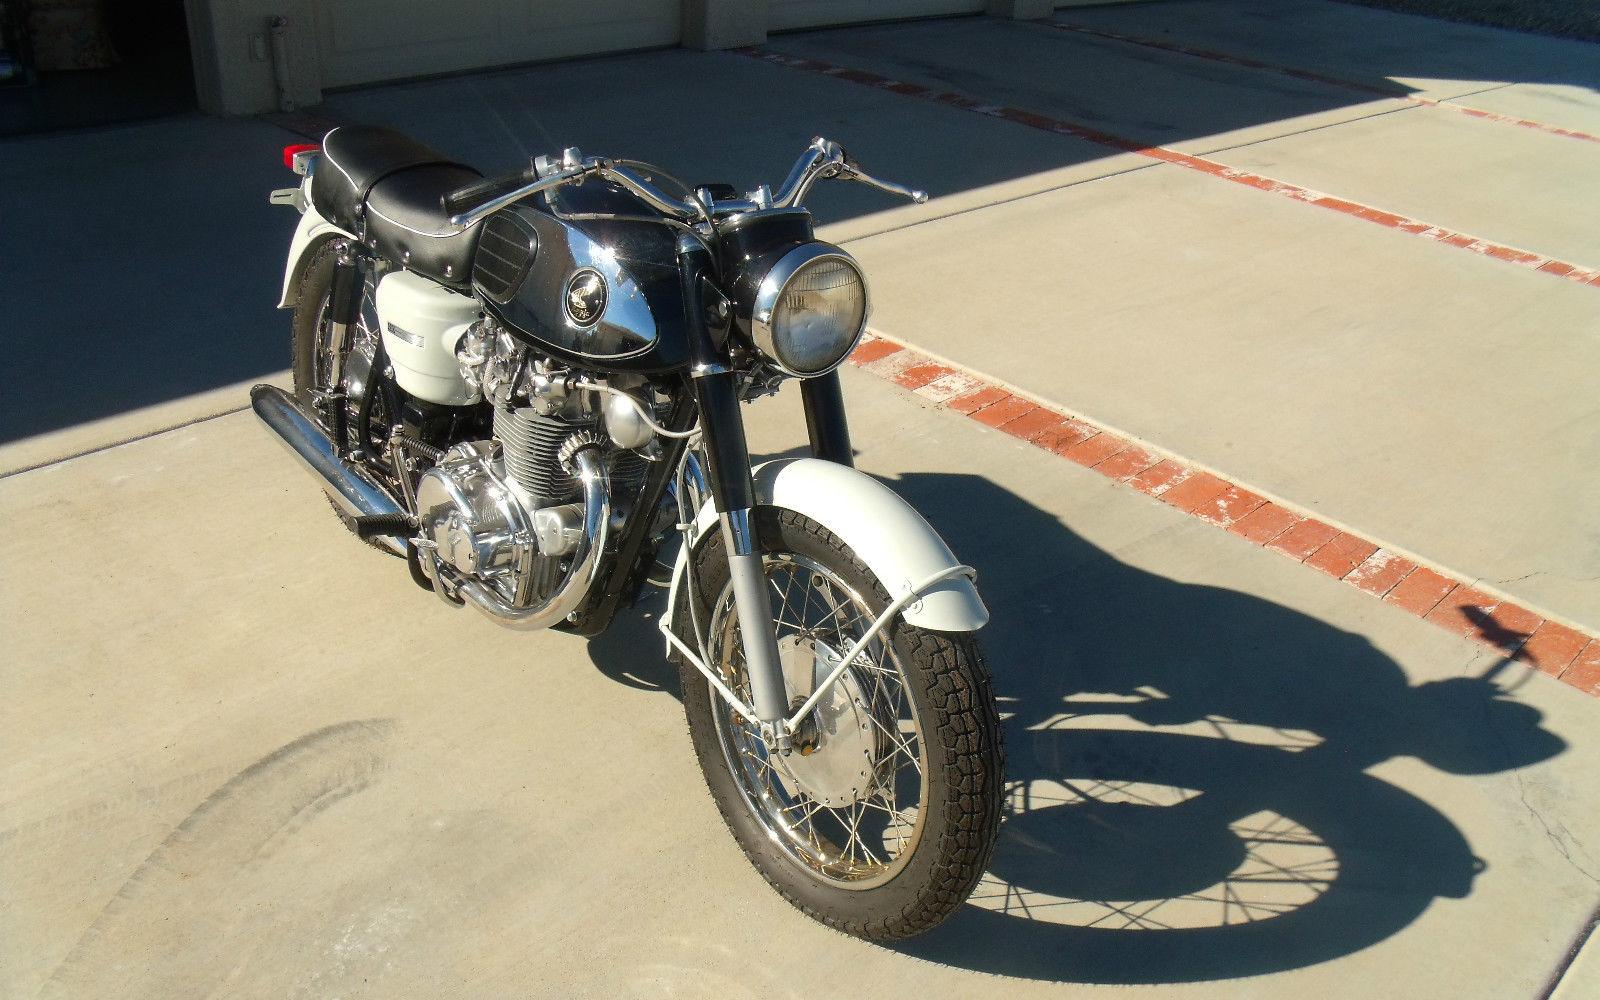 Honda CB450 Black Bomber - 1967 - Handlebars, Headlight and Levers.